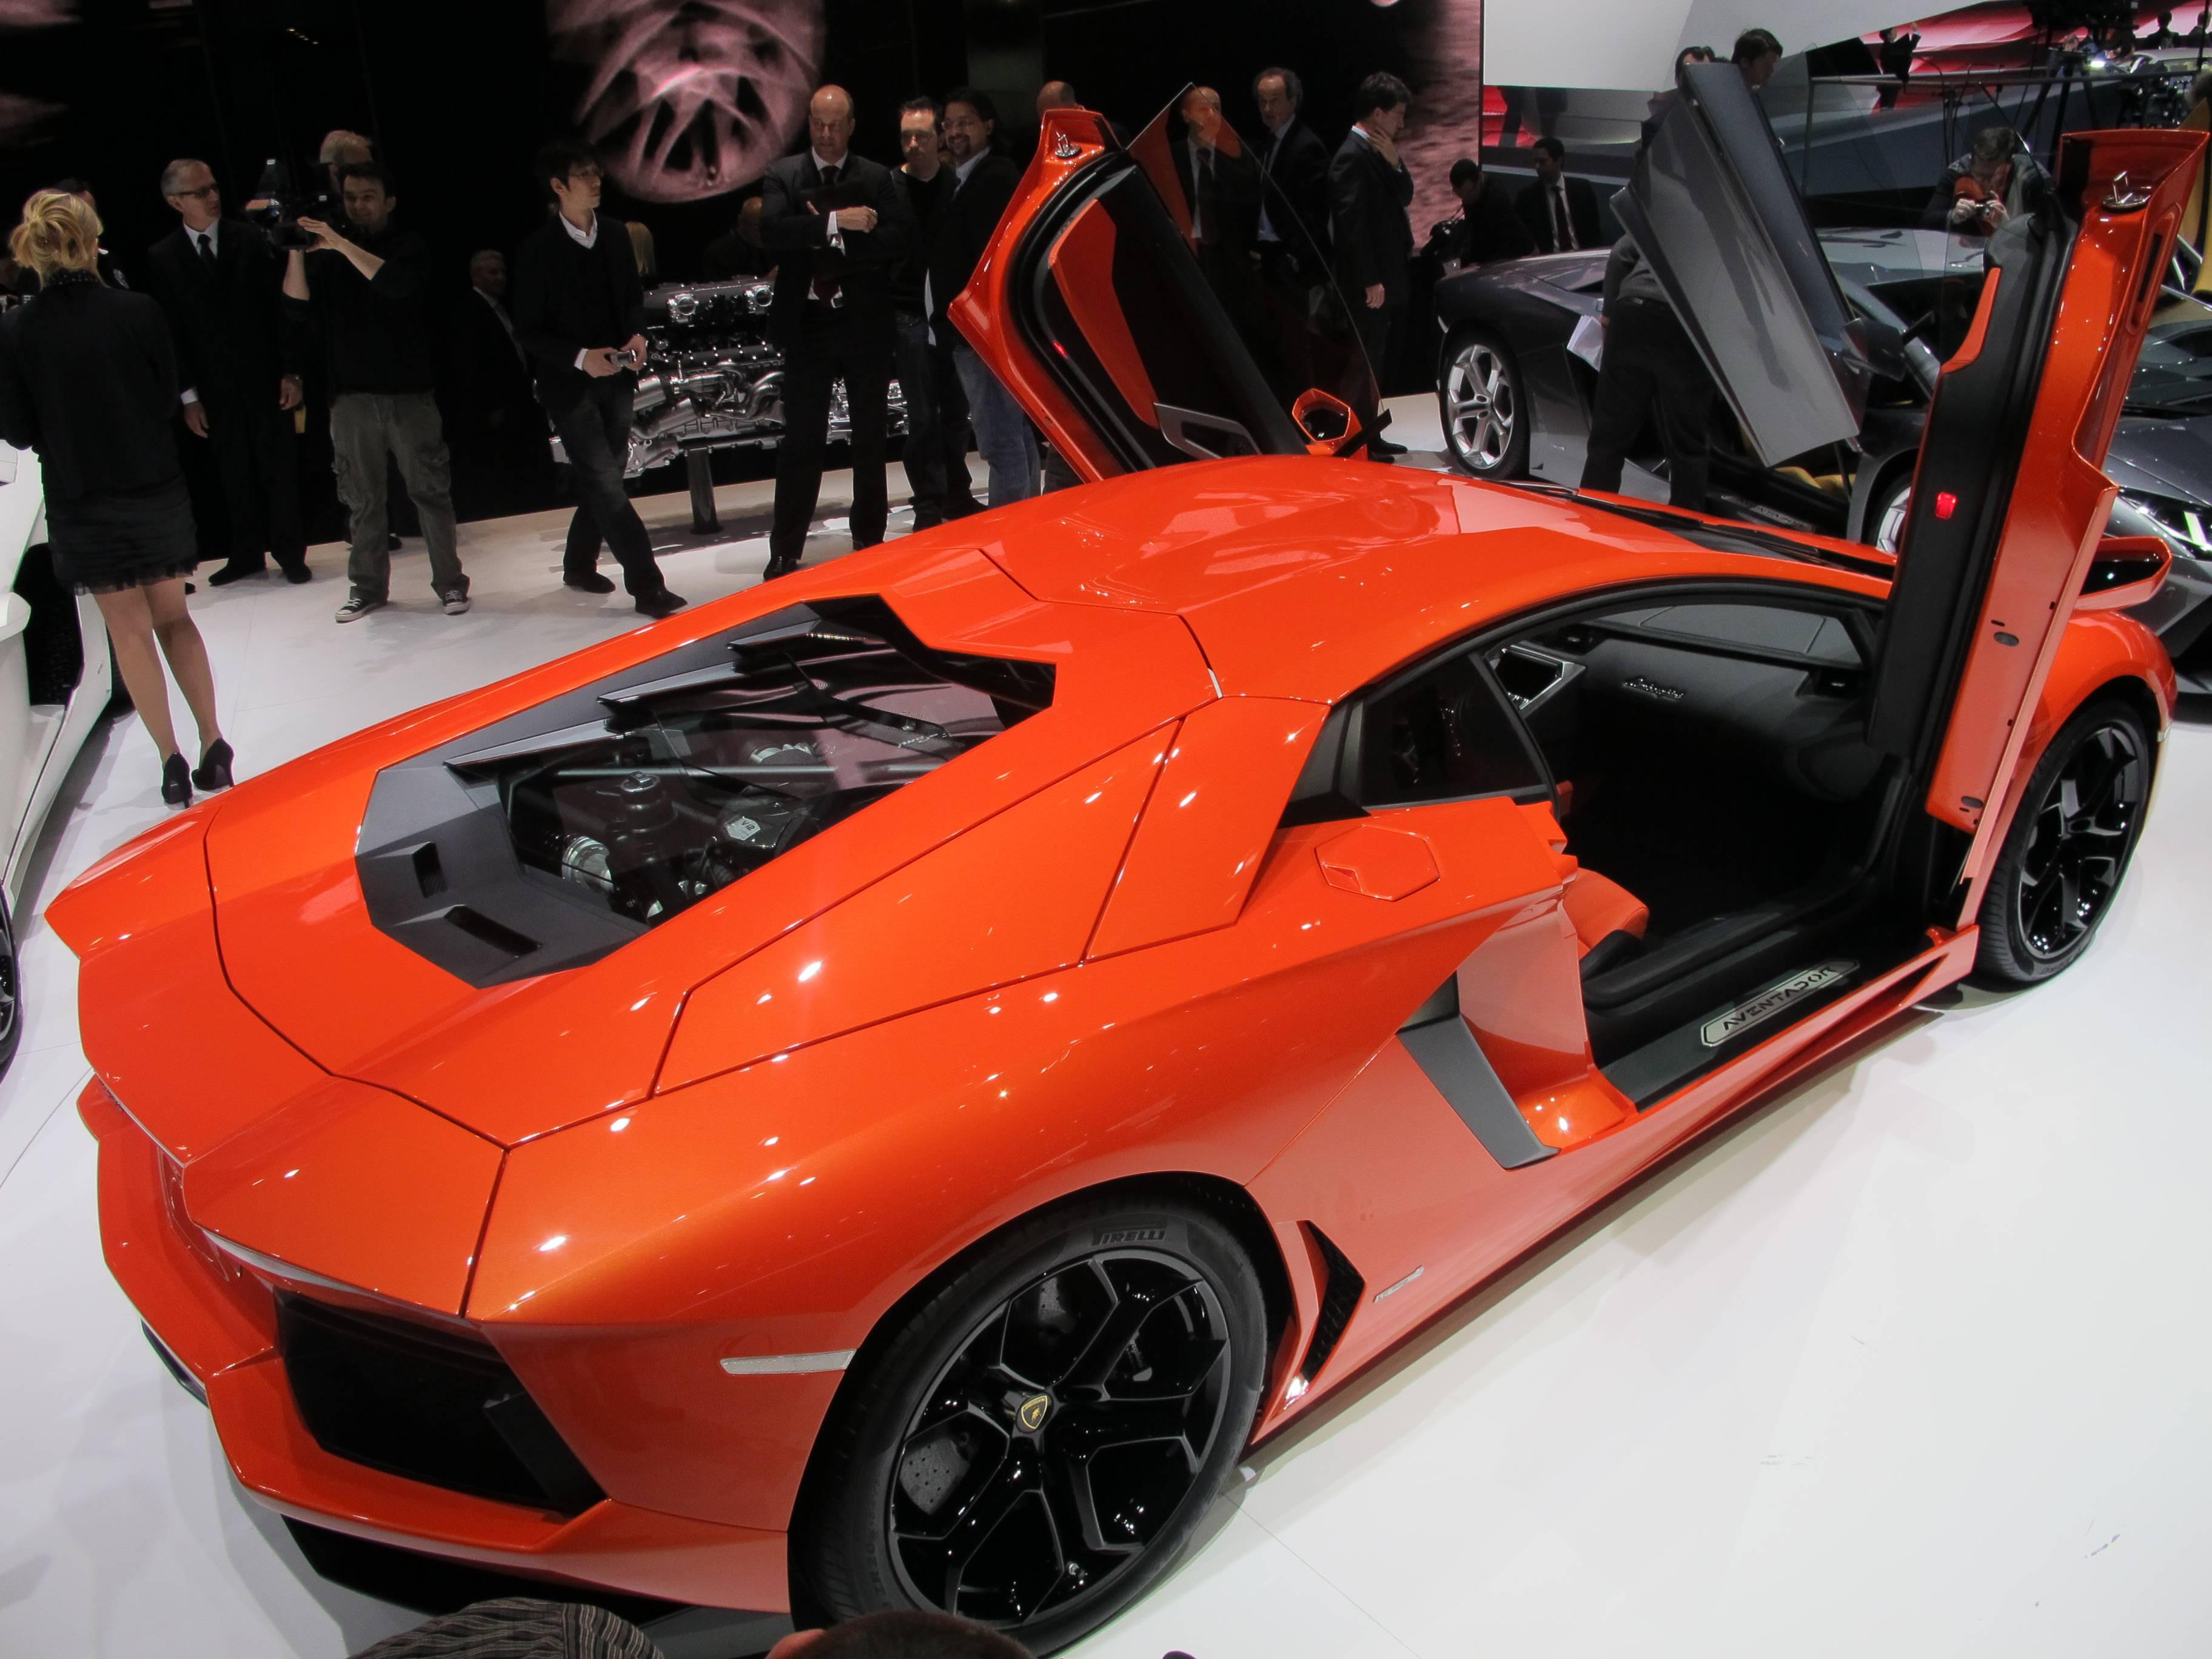 Geneva Motor Show - Lamborghini Aventador LP 700-4